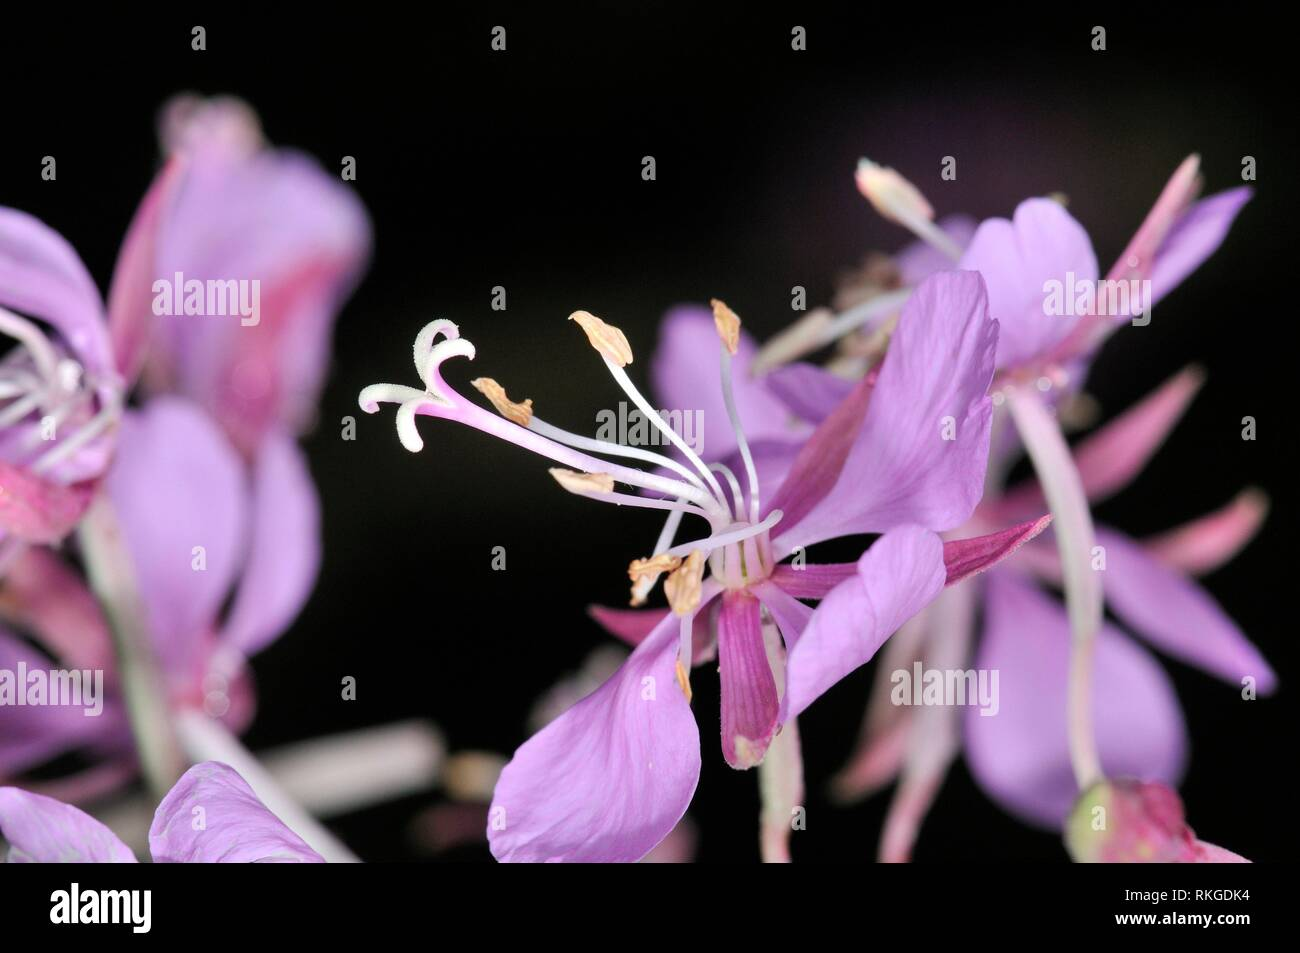 Flowers of Fireweed (Epilobium angustifolium, fam. Onagraceae. Sorteny valley, Natural Park. Andorra. - Stock Image